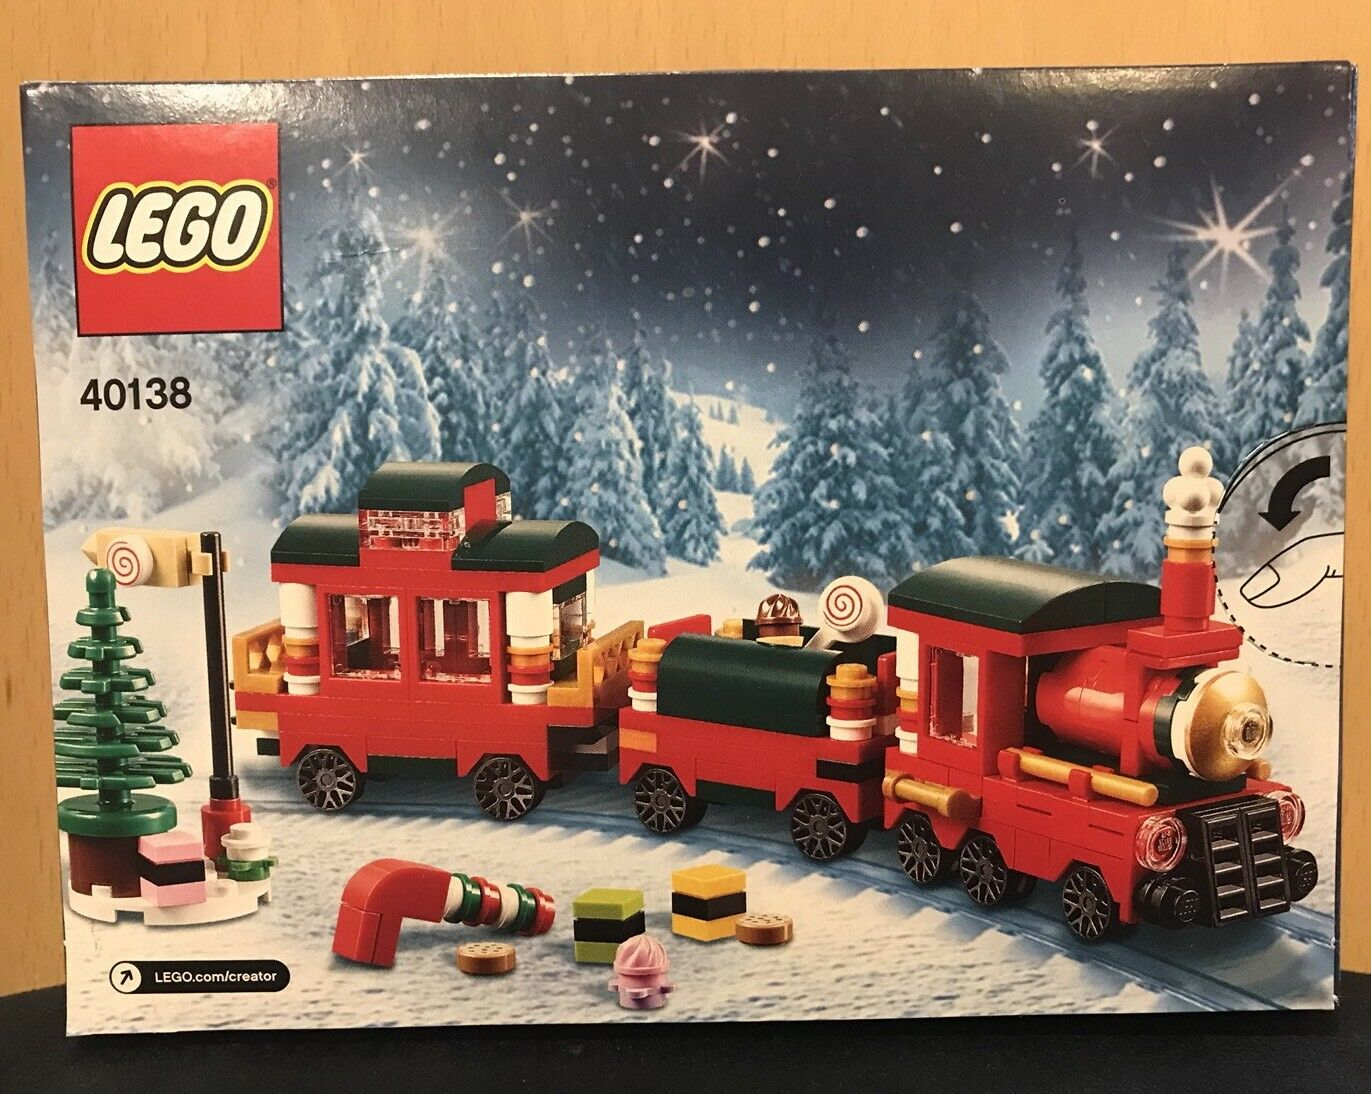 Lego 40138 2015 Limited Edition Holiday Christmas Christmas Christmas Train Retired Set New 63bc1d